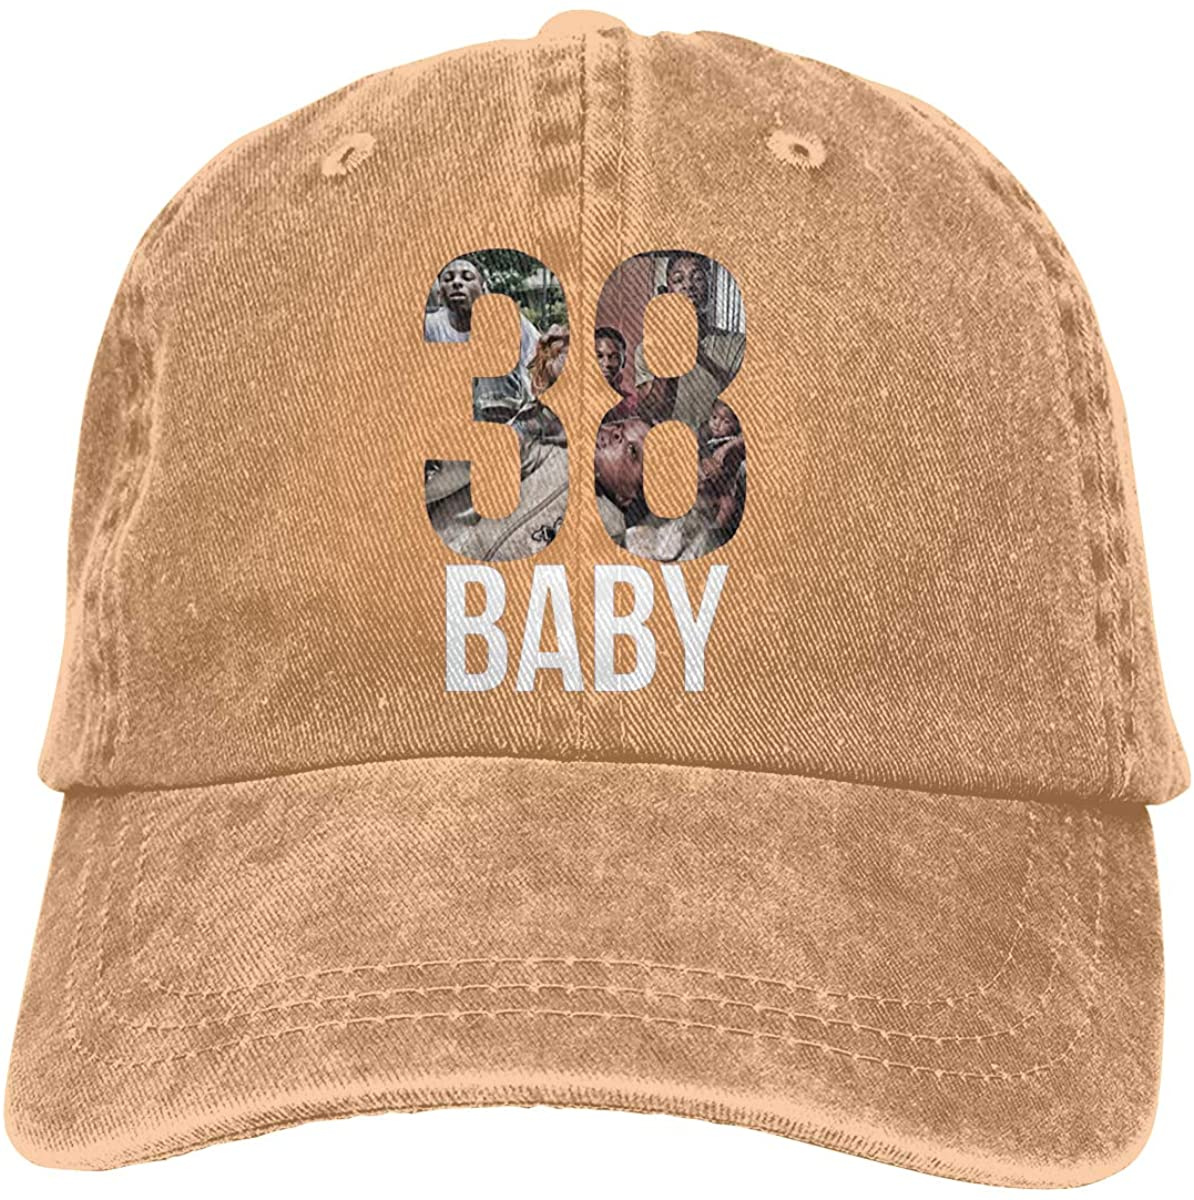 Never Broke Again Adults Cowboy Hat